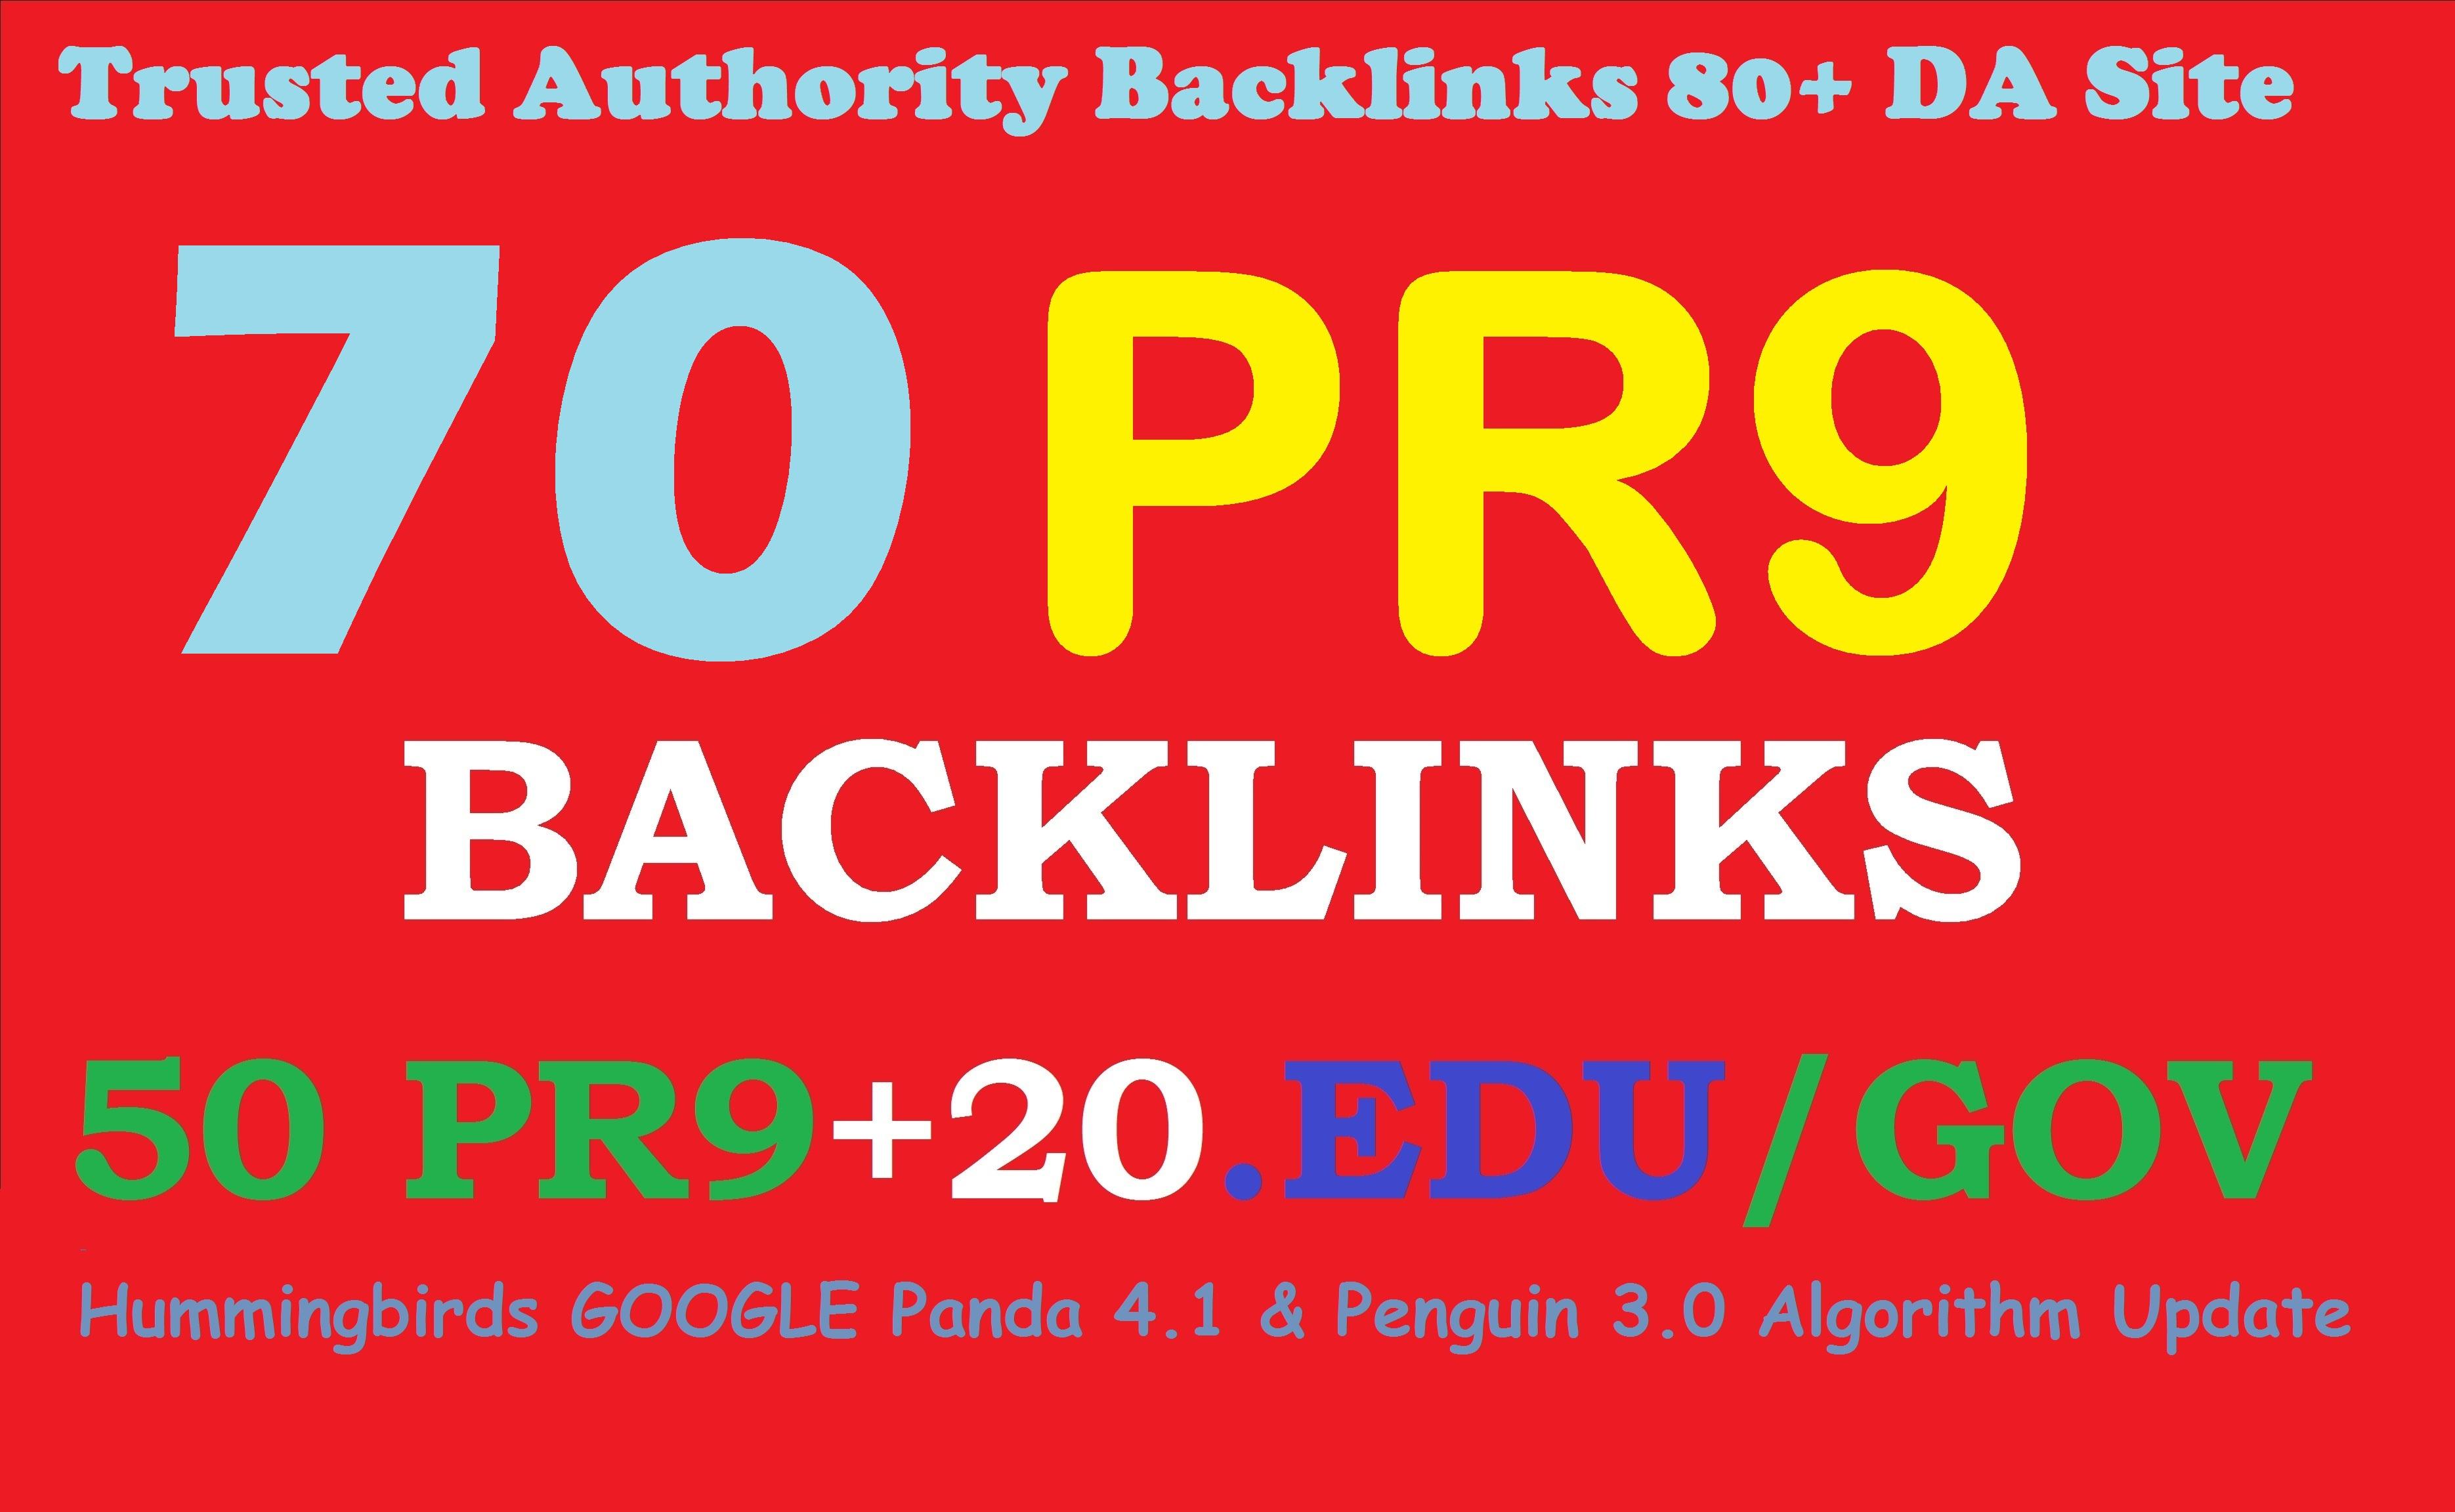 Exclusively 70 backlinks 50 PR9+20 EDU/GOV 80+DA Manual & Safe SEO For Boost Your Google Ranking